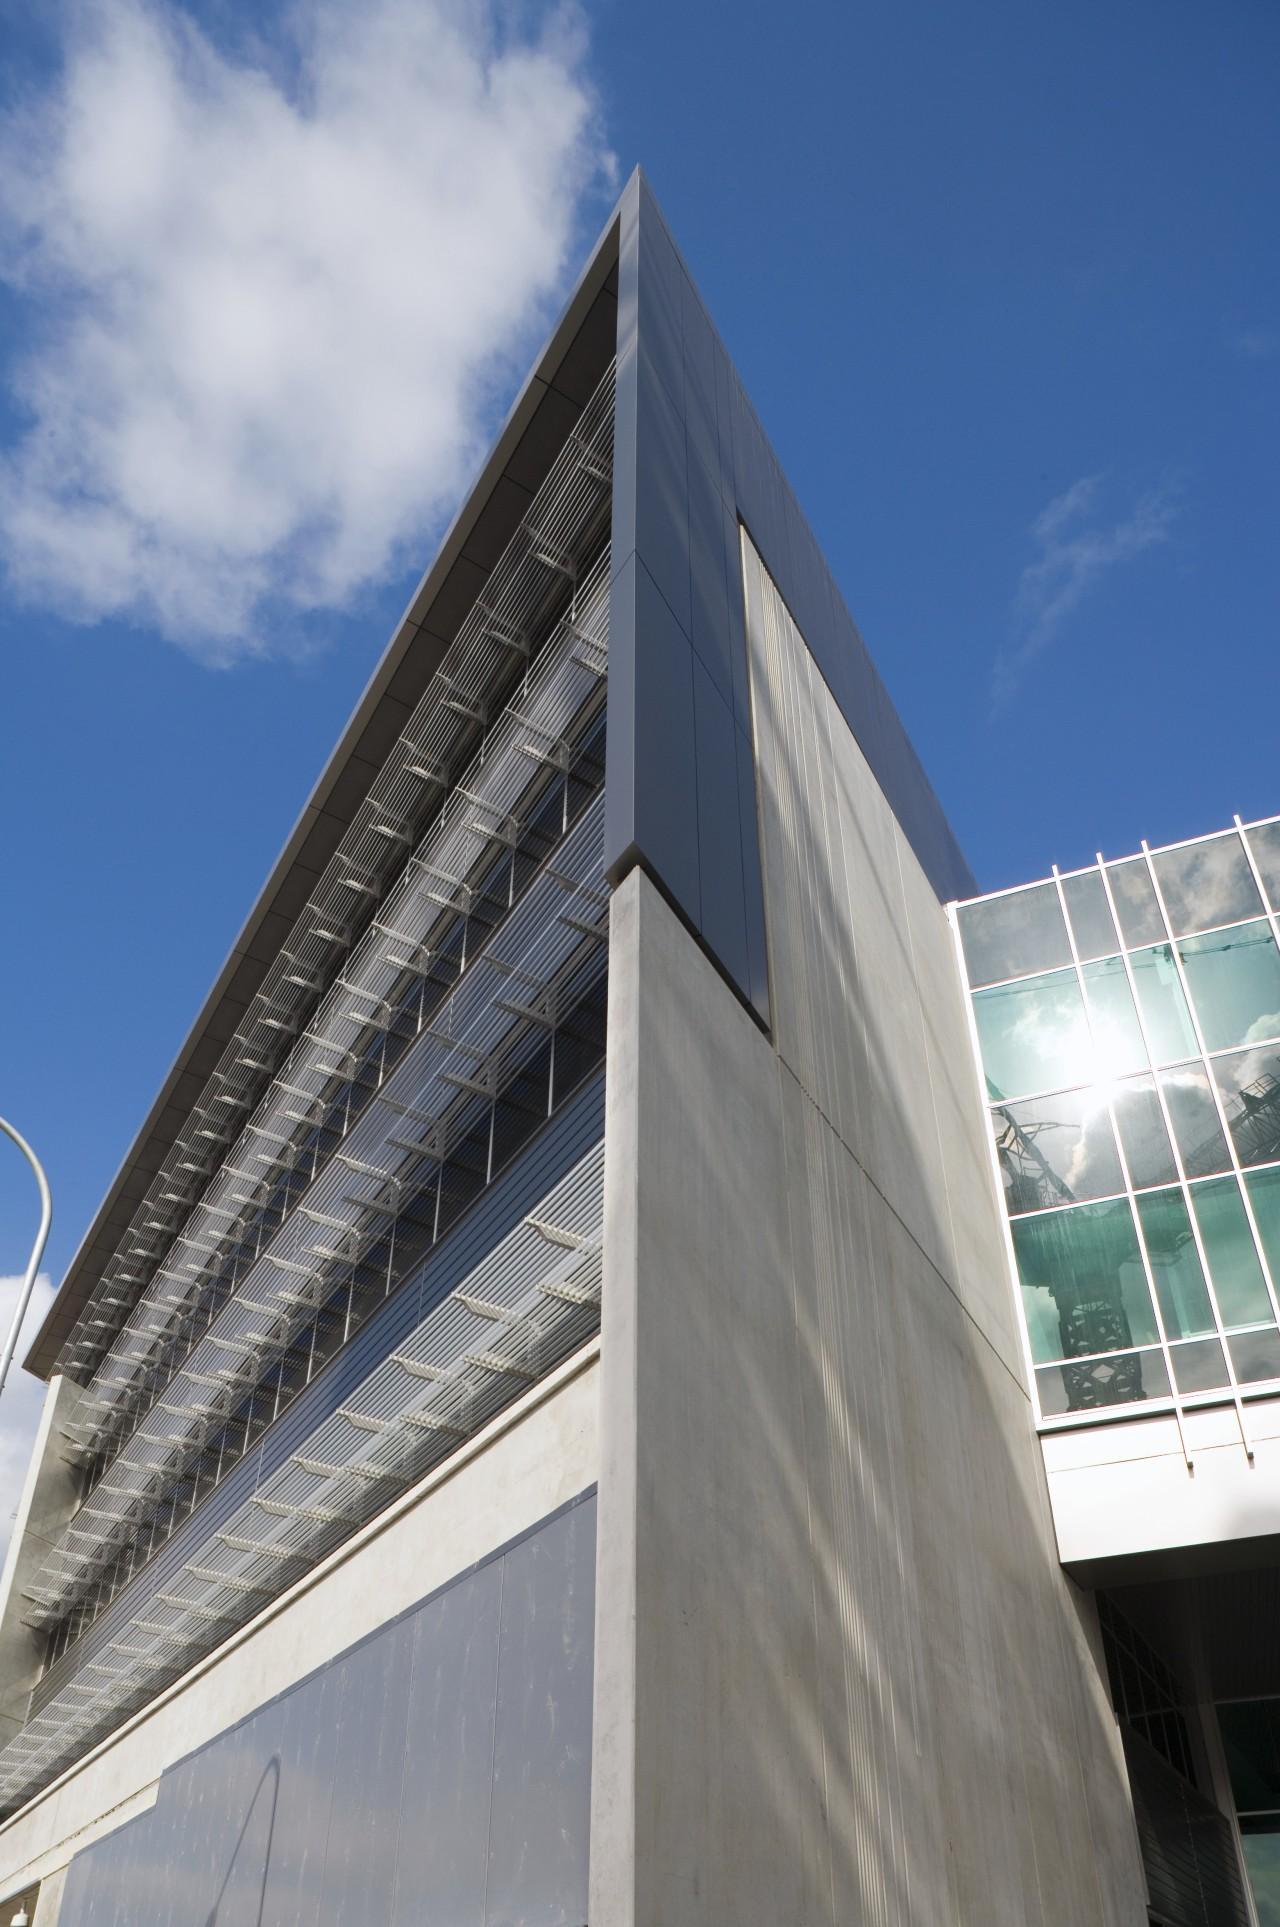 An exterior view of the greensquare building. DKL architecture, building, commercial building, condominium, corporate headquarters, daylighting, daytime, facade, headquarters, landmark, metropolis, metropolitan area, sky, skyscraper, gray, blue